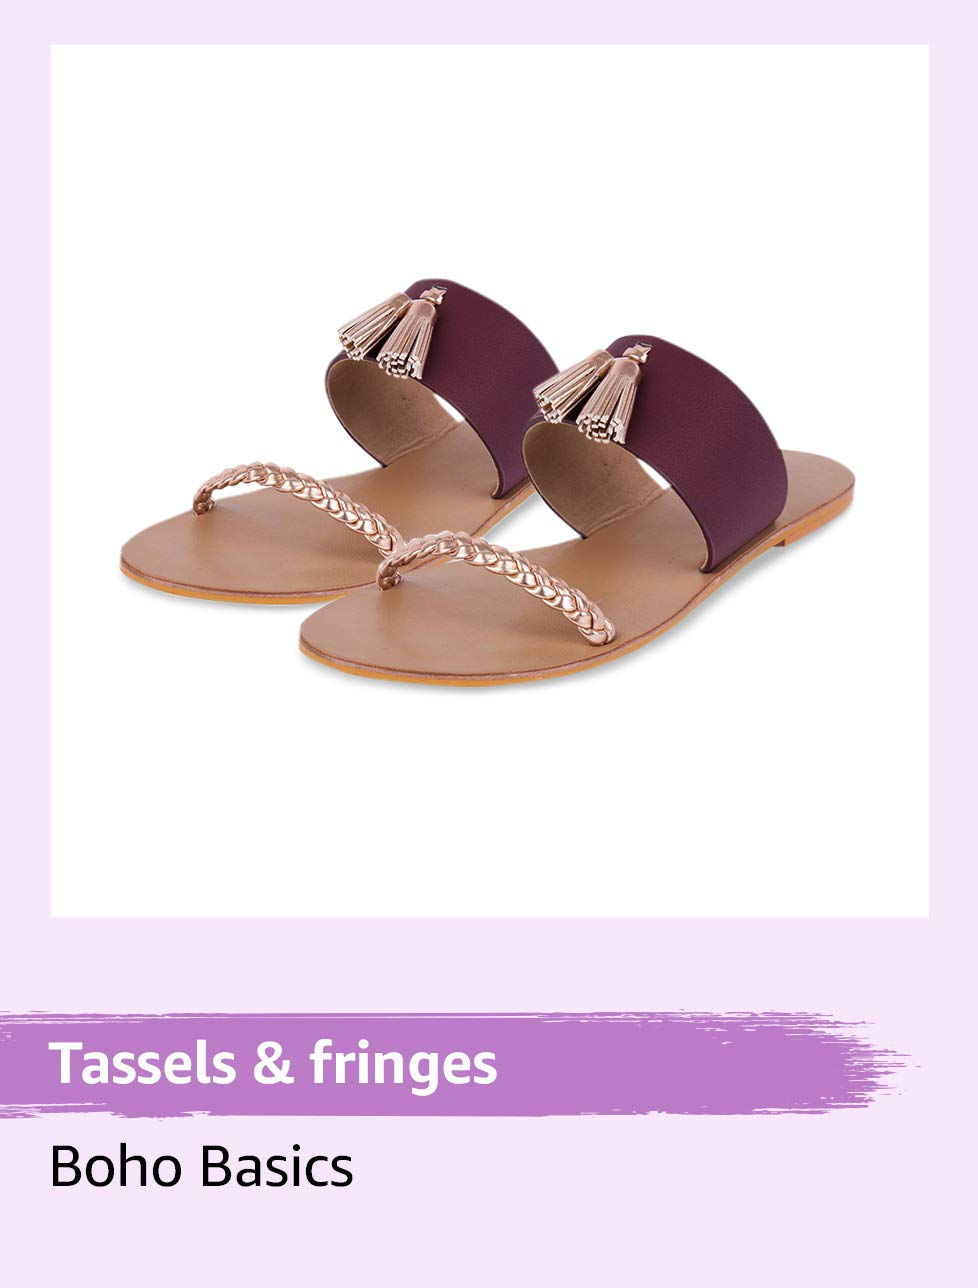 Tassels & fringes